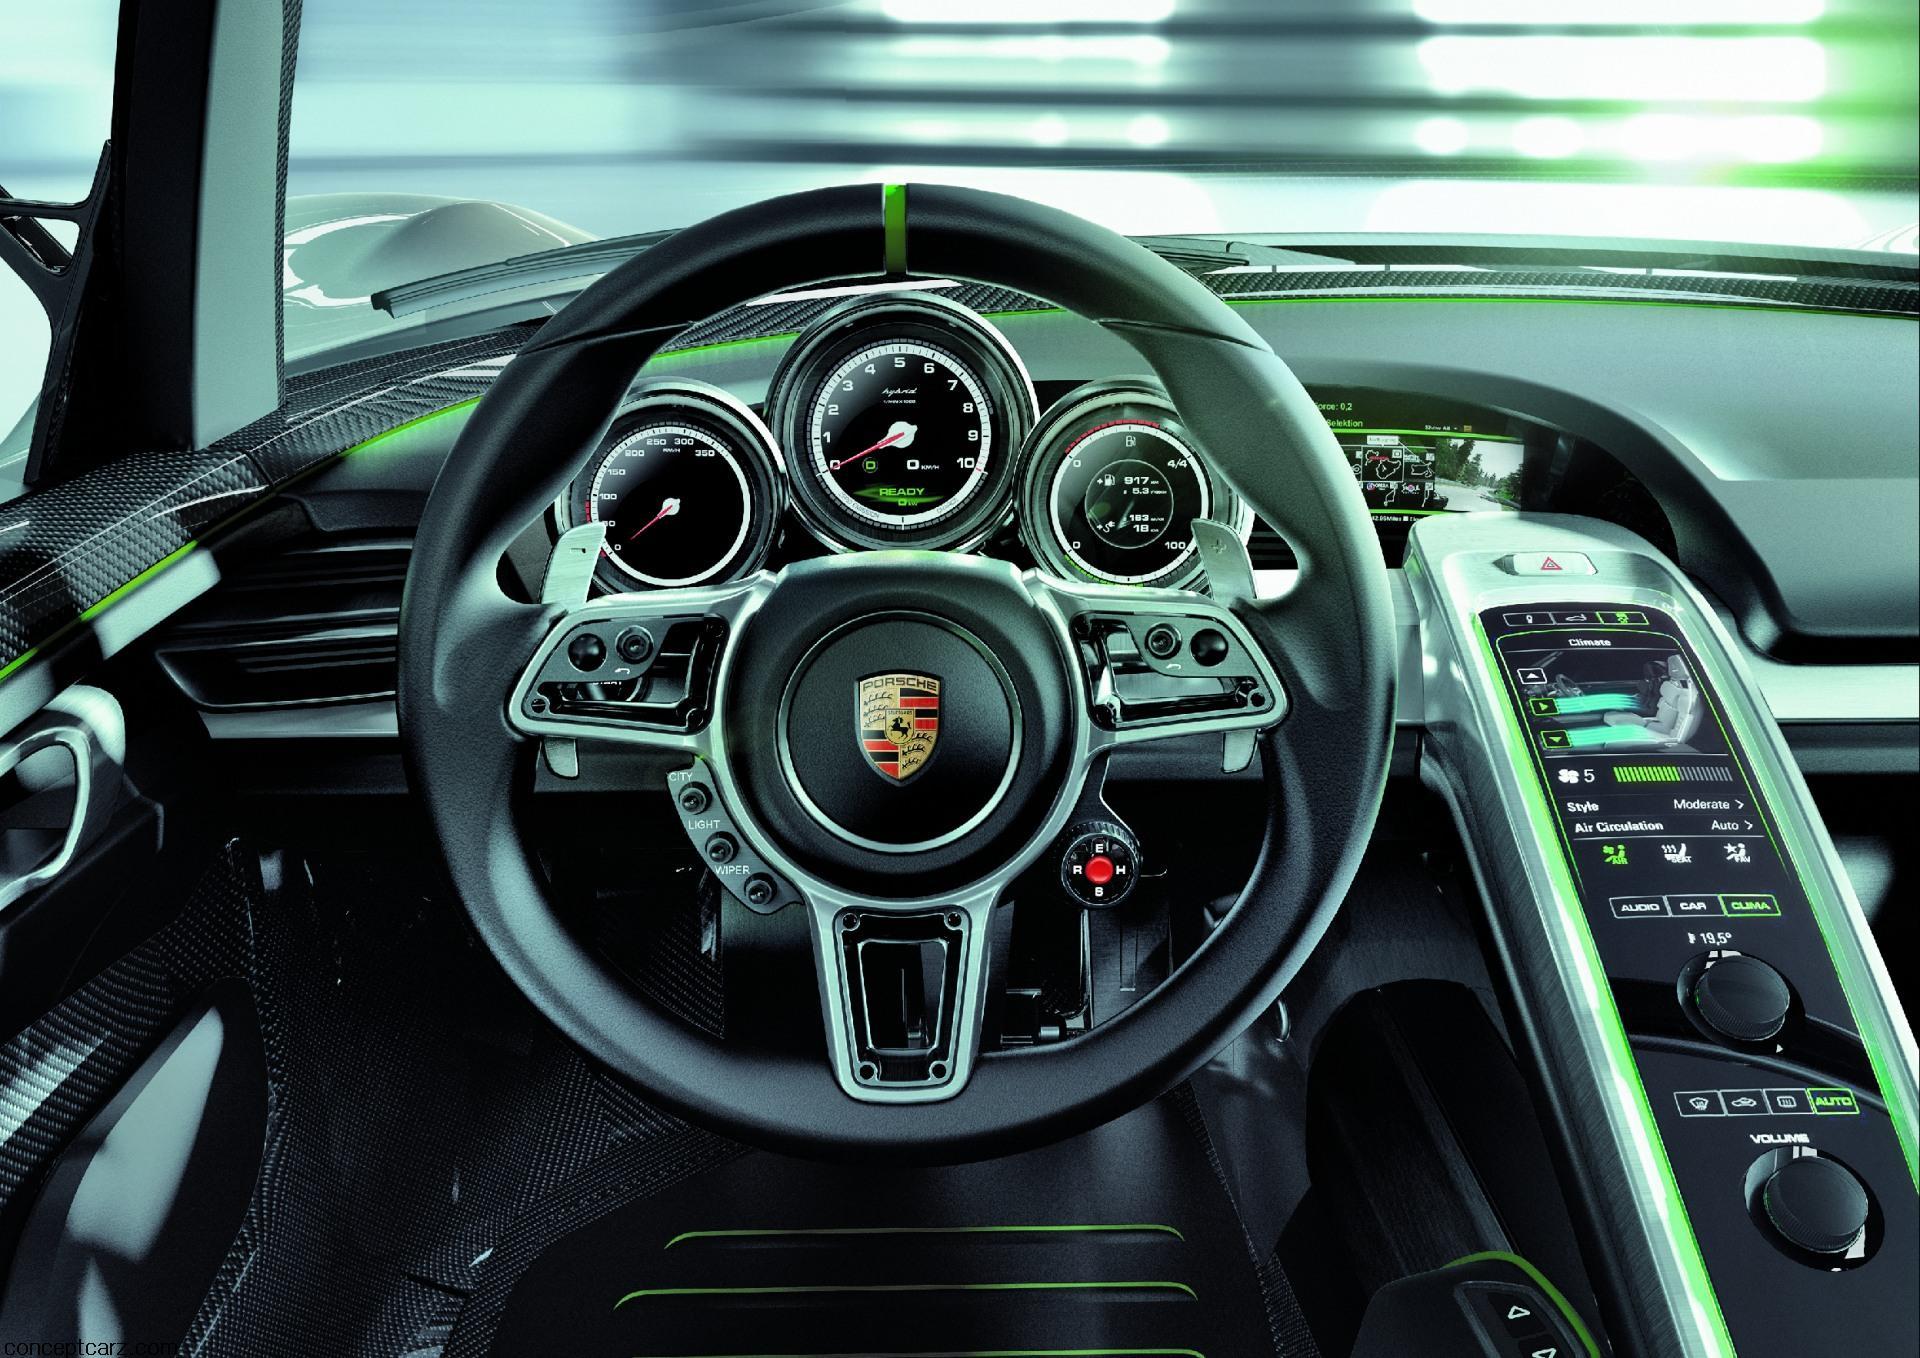 2010 porsche 918 spyder concept image - Porsche 918 Production Wallpaper